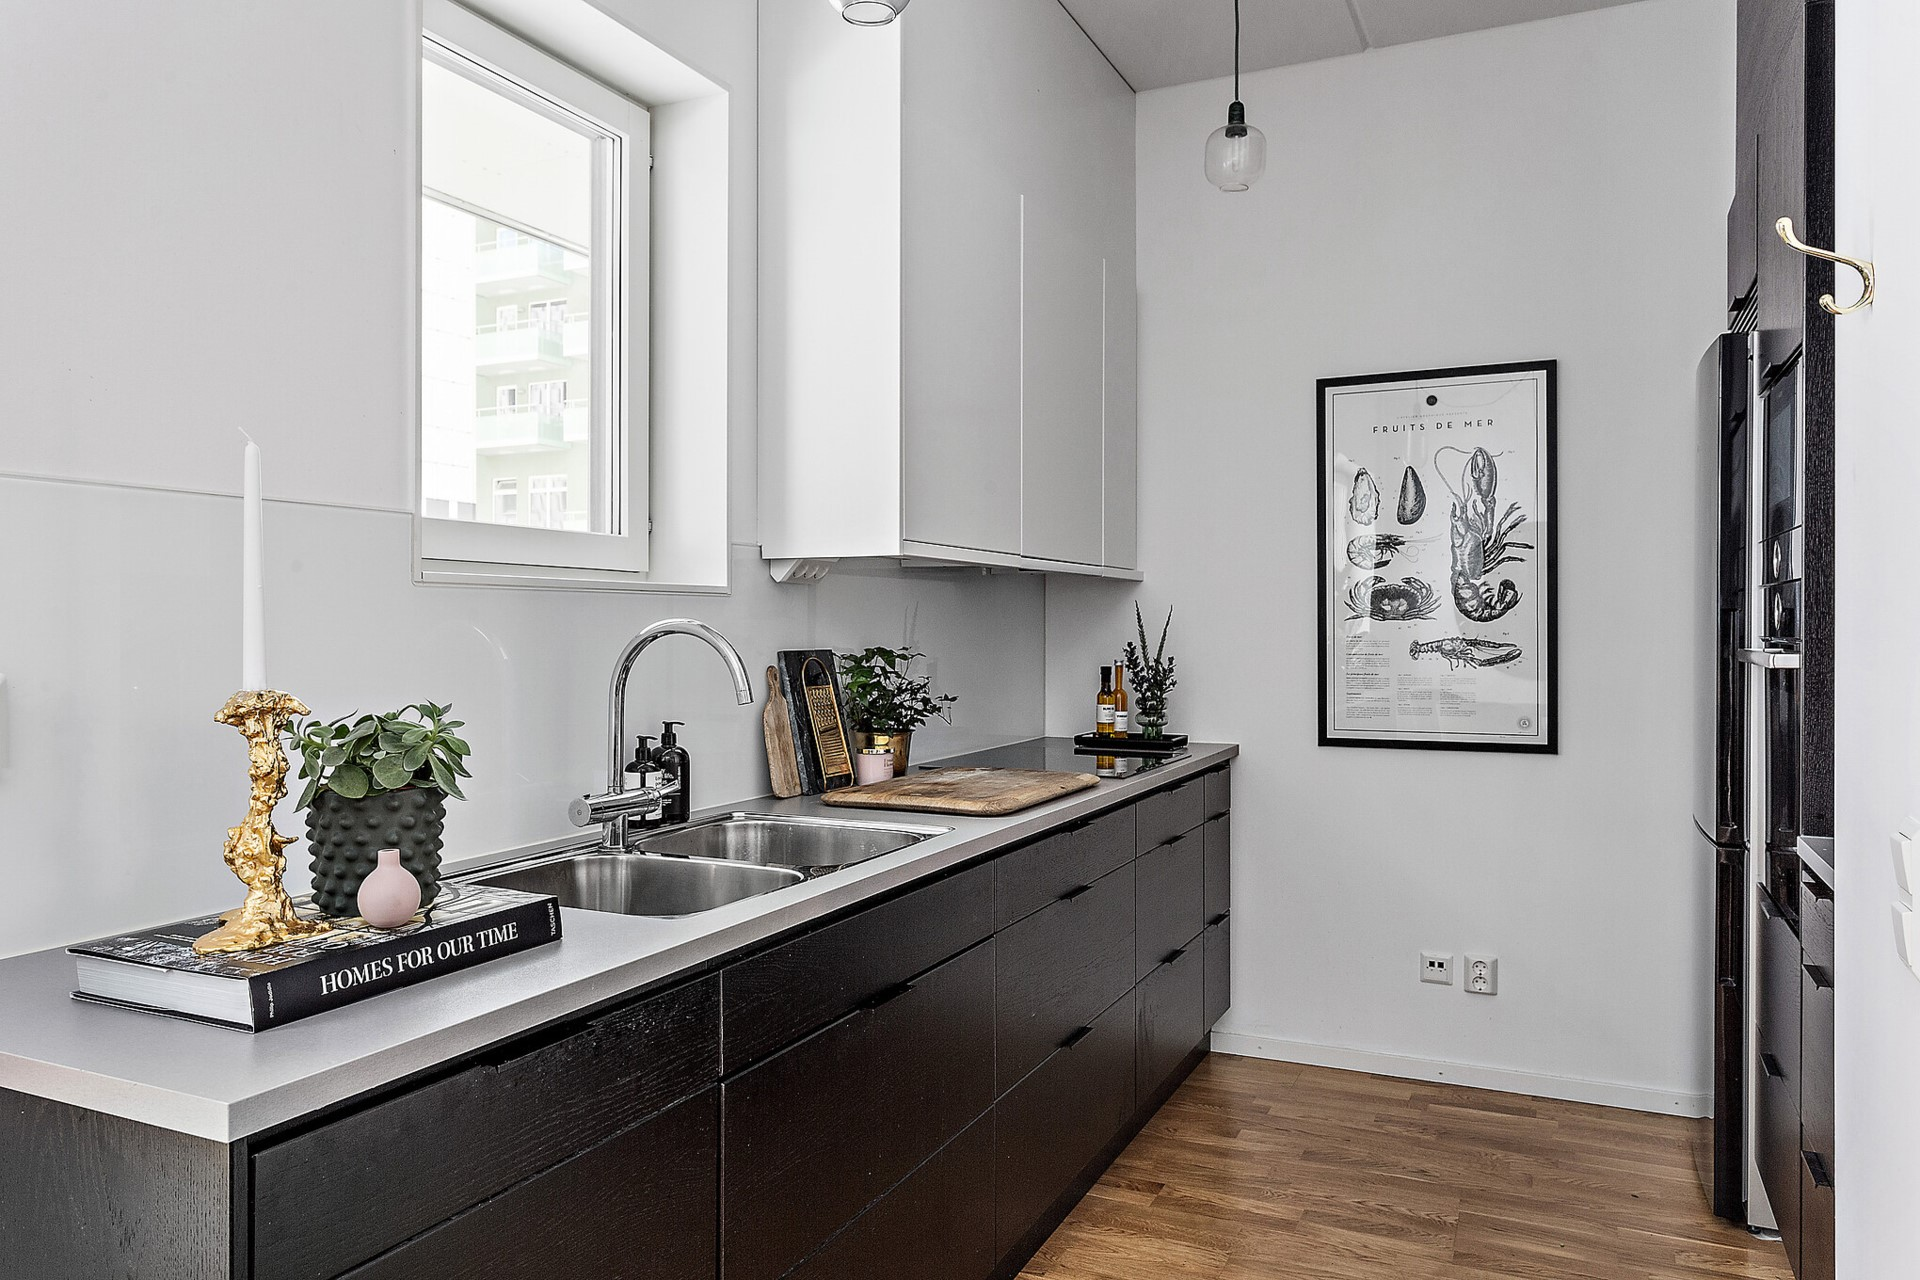 Ekfatsgatan 6 - Modernt kök med fin maskinpark.